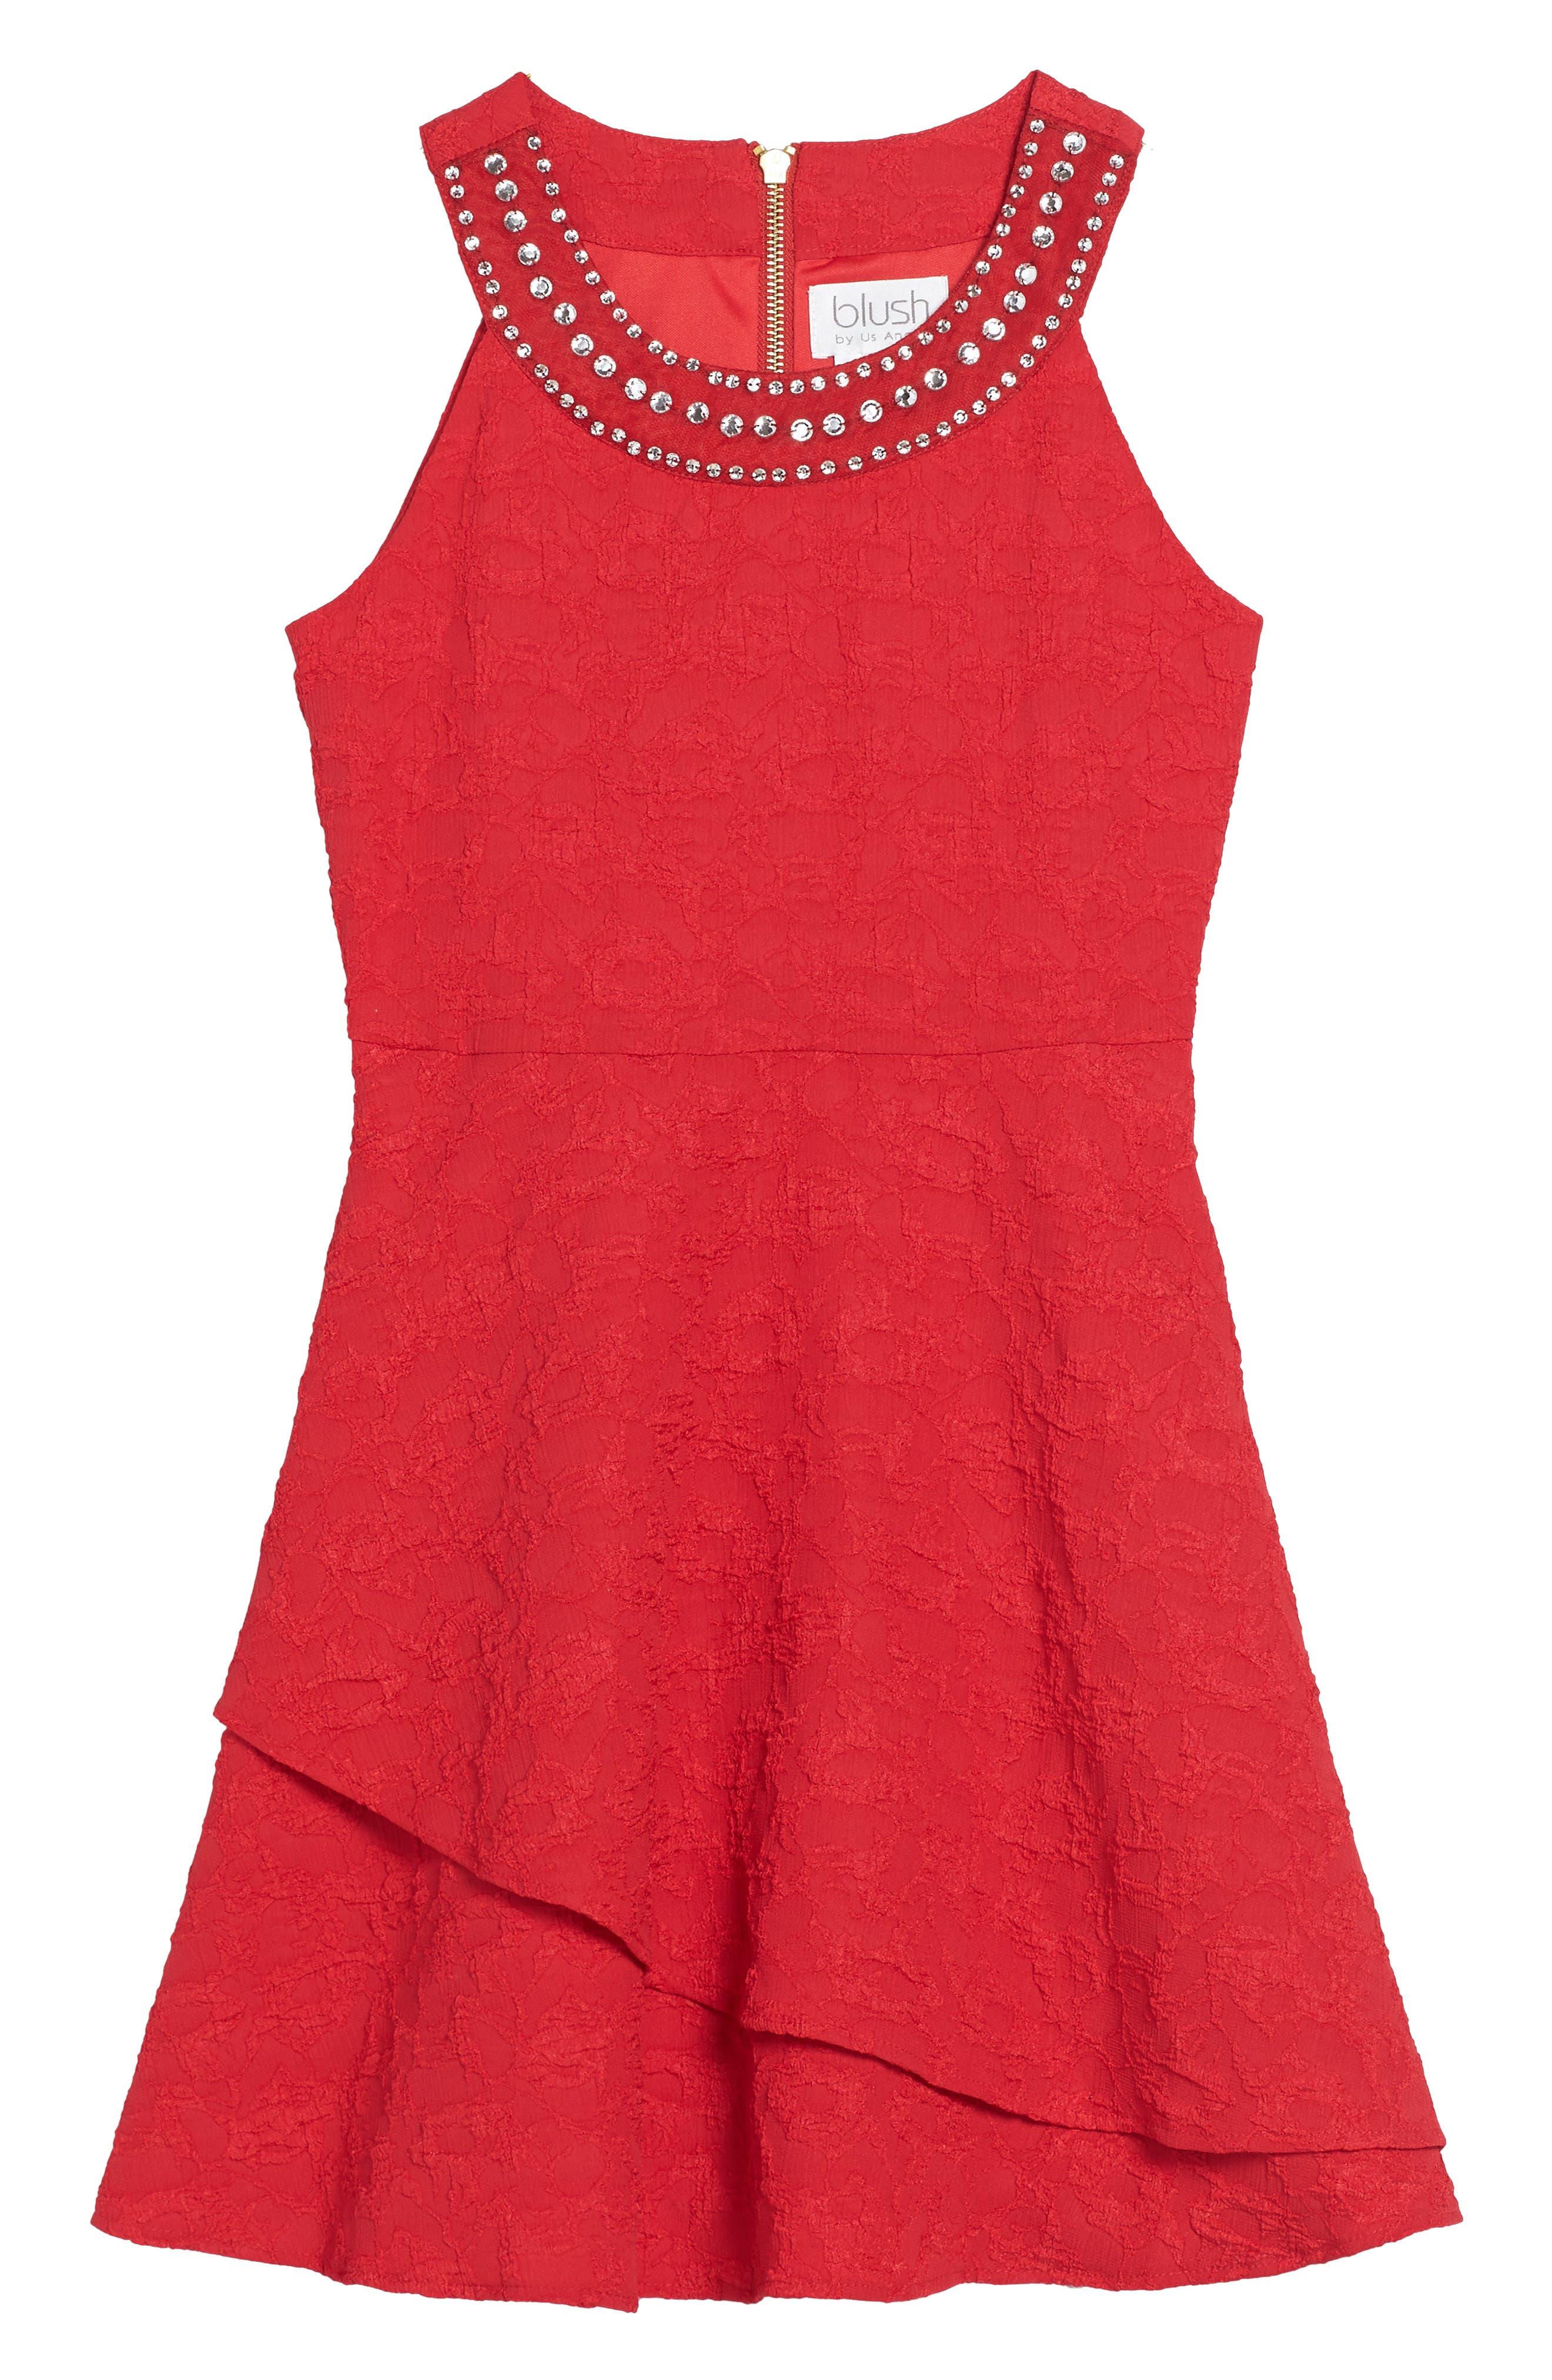 Main Image - BLUSH by Us Angels Jewel Neck Fit & Flare Dress (Big Girls)